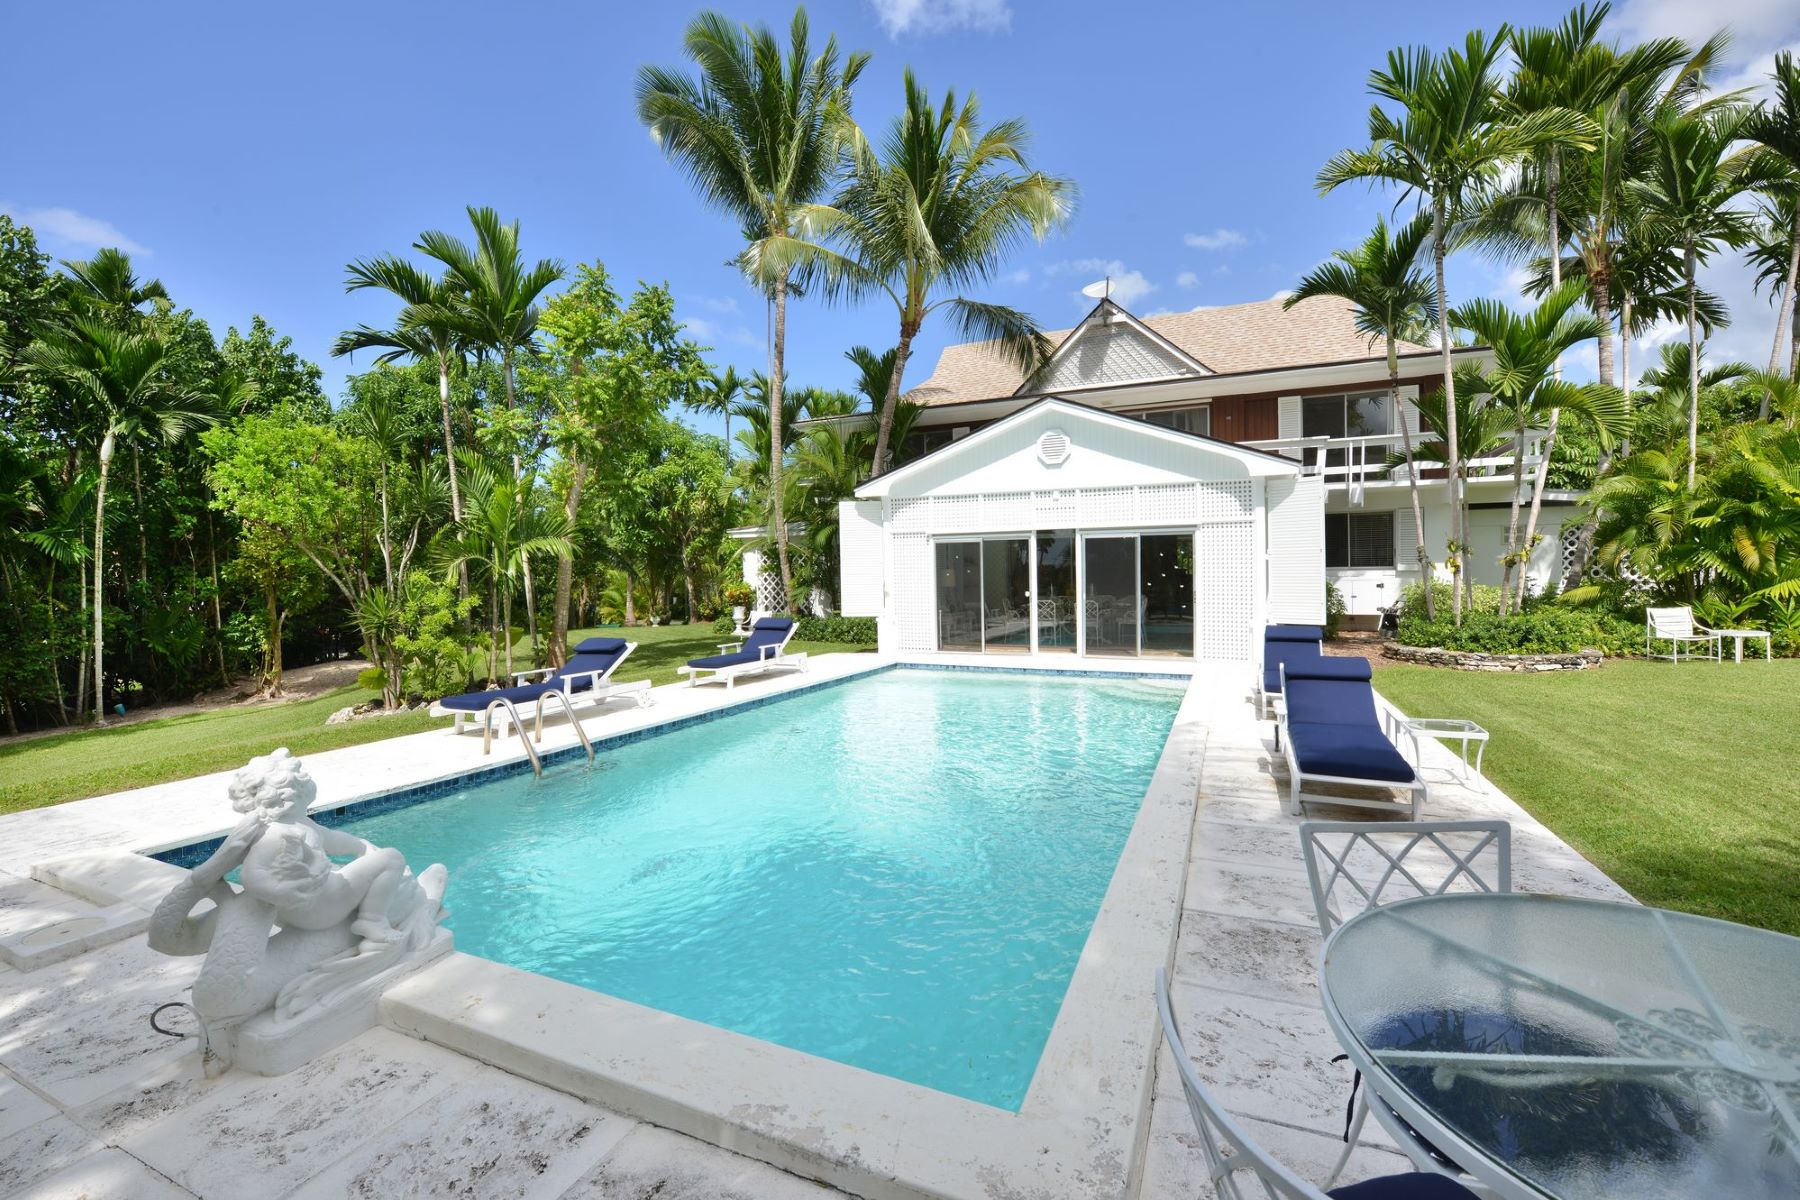 Single Family Home for Rent at Executive Rental Nassau, Nassau And Paradise Island Bahamas